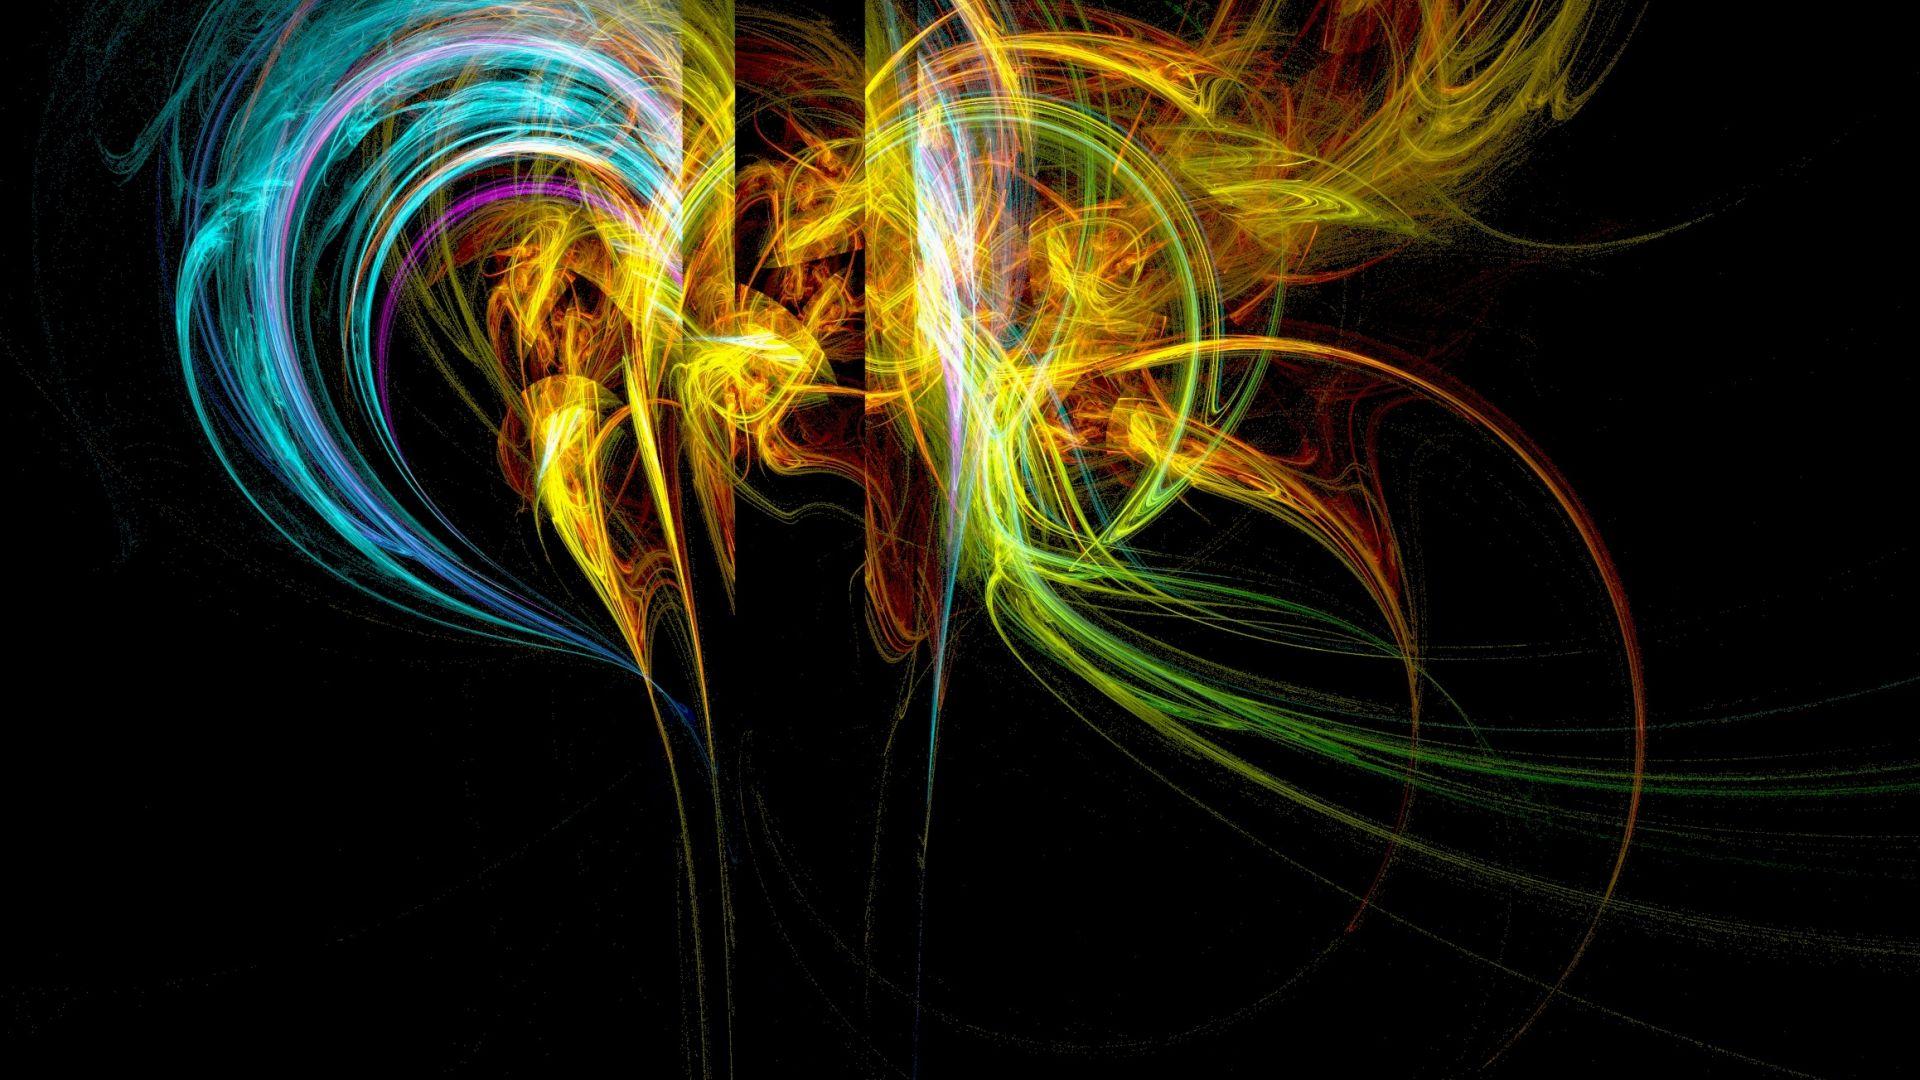 Wallpaper Abstract, digital art, colorful smoke